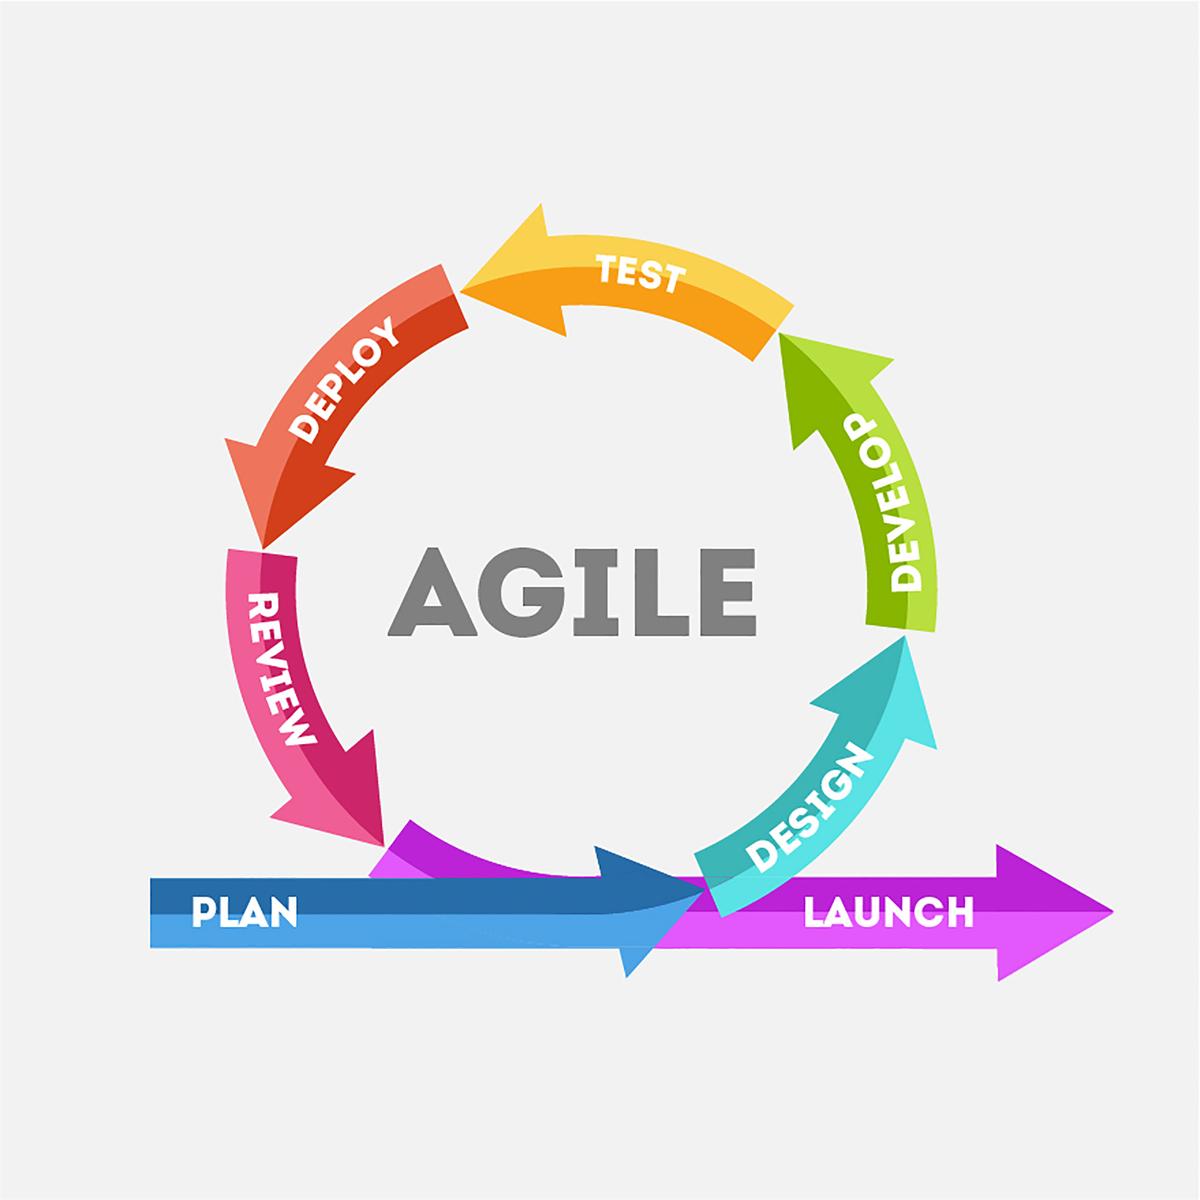 duplicate work in agile